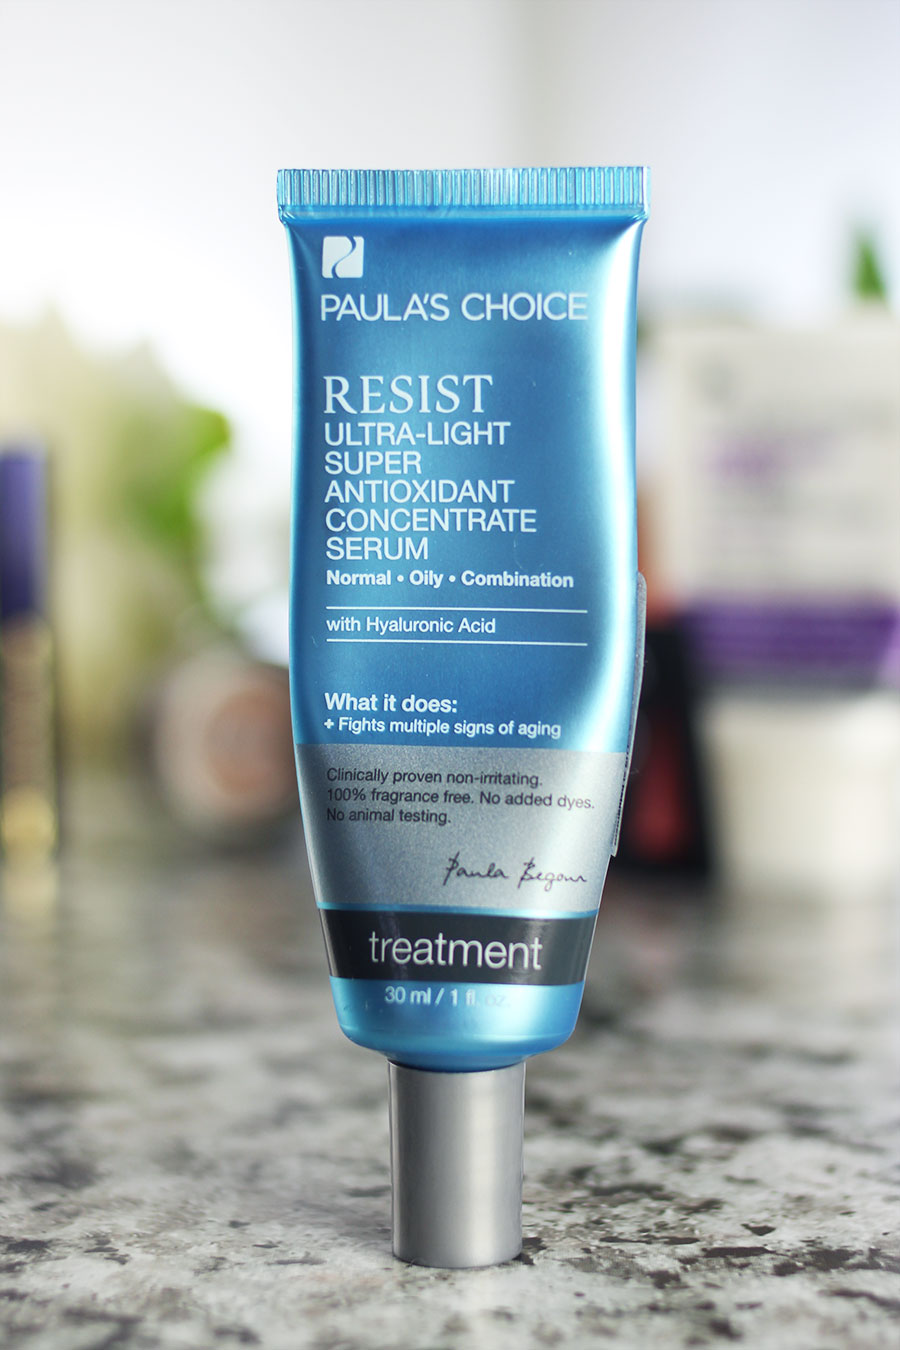 Beauty-Favoriten-1-2016-paulas-choice-resist-ultra-light-antioxidant-concentrate-serum